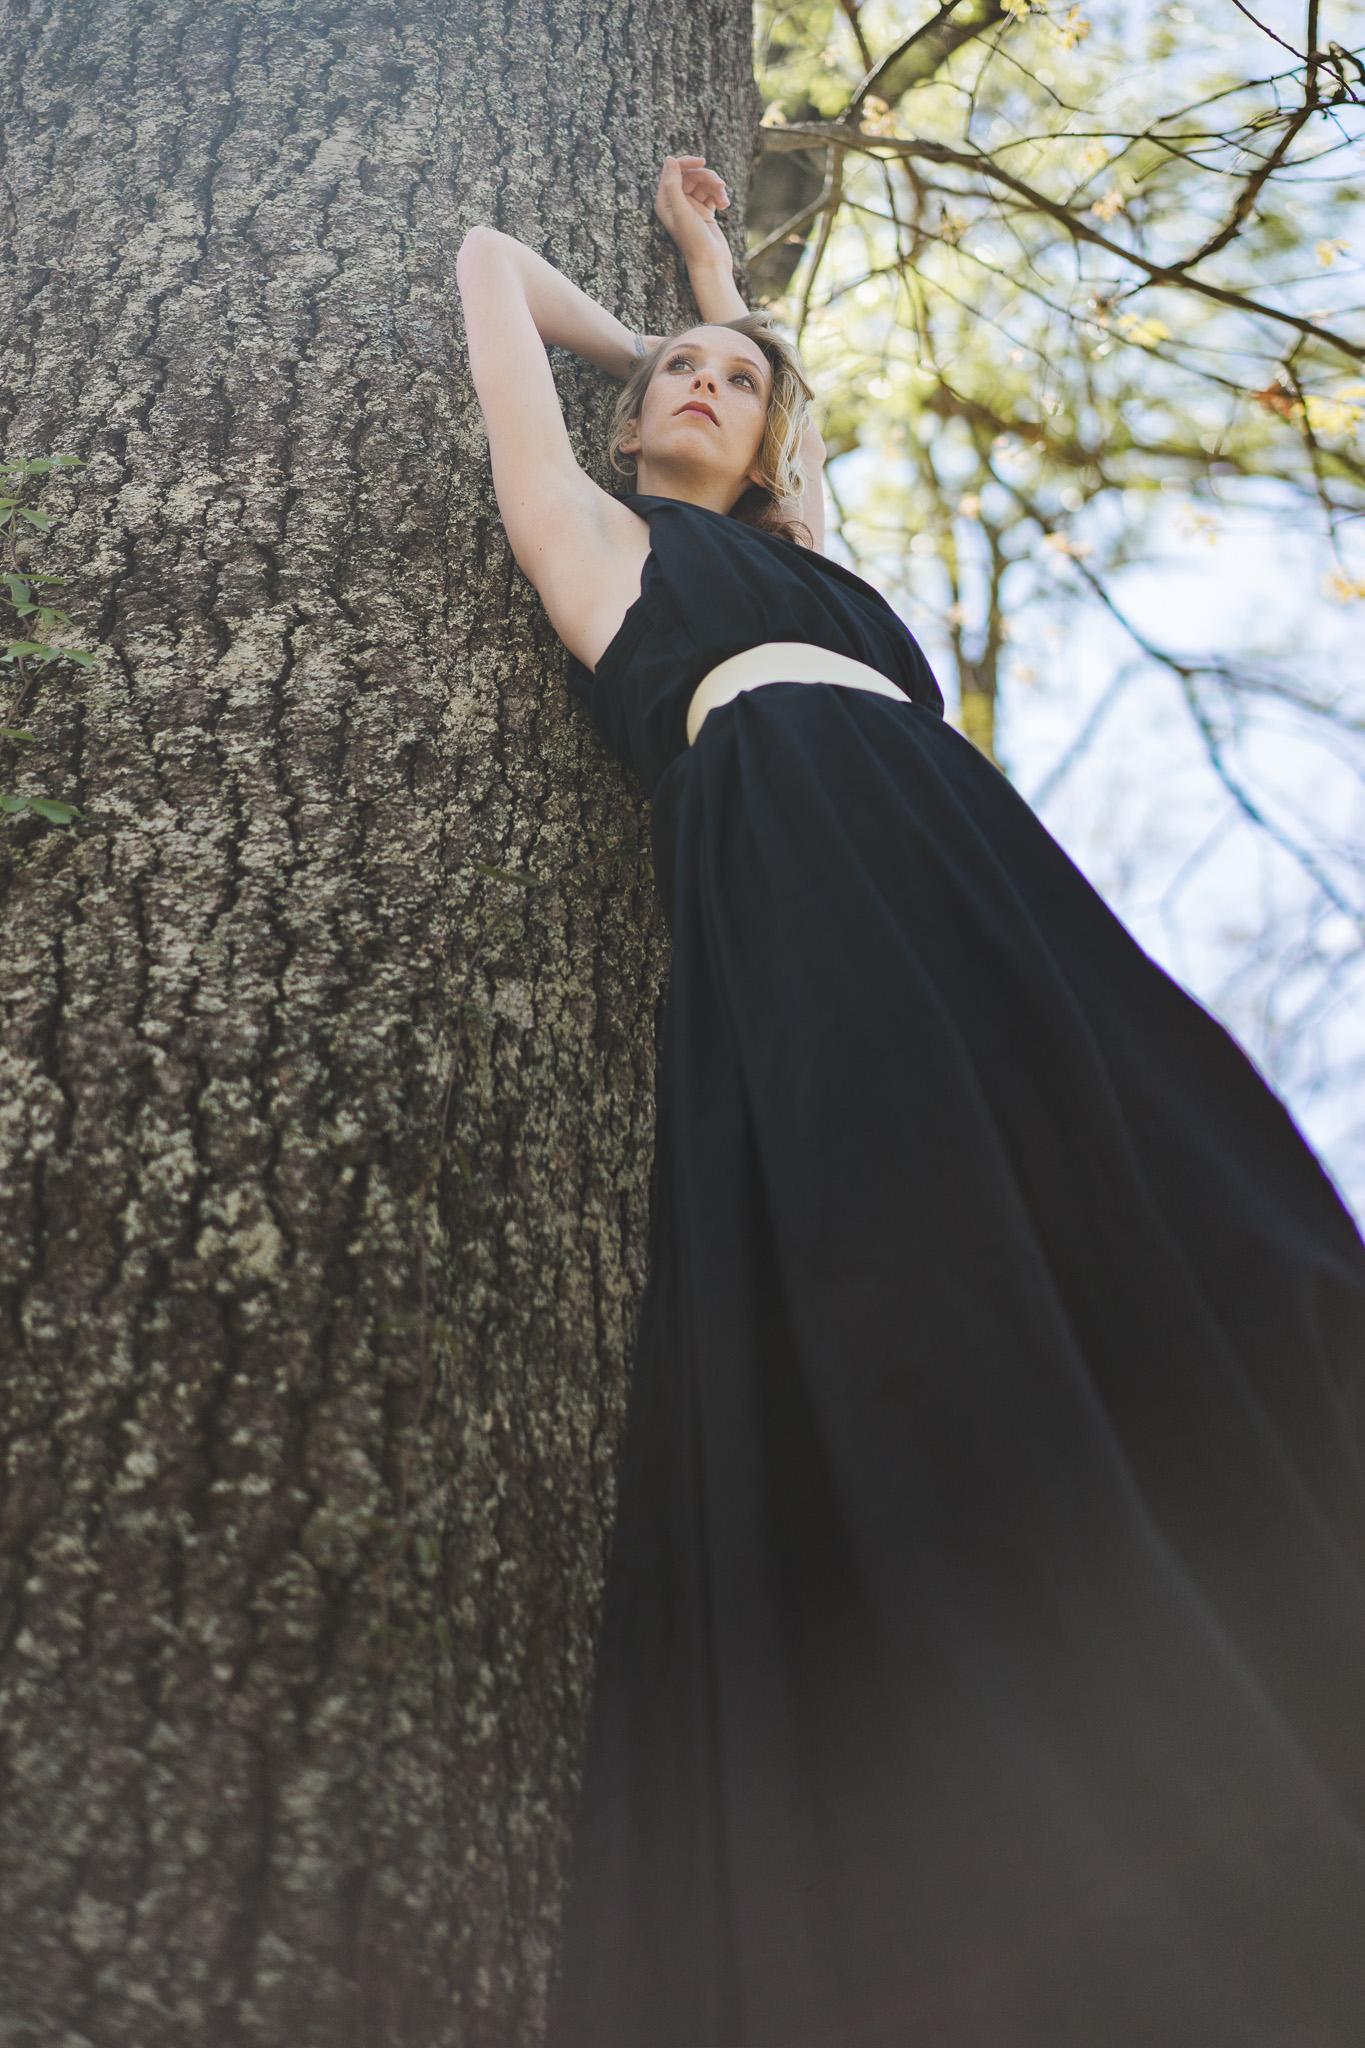 Model: Nicolette Grenier  MUA:Crystal AnnJae Styles  Cameras used: Sony A7  Lens:Sonnar T* FE 55mm F1.8 Z